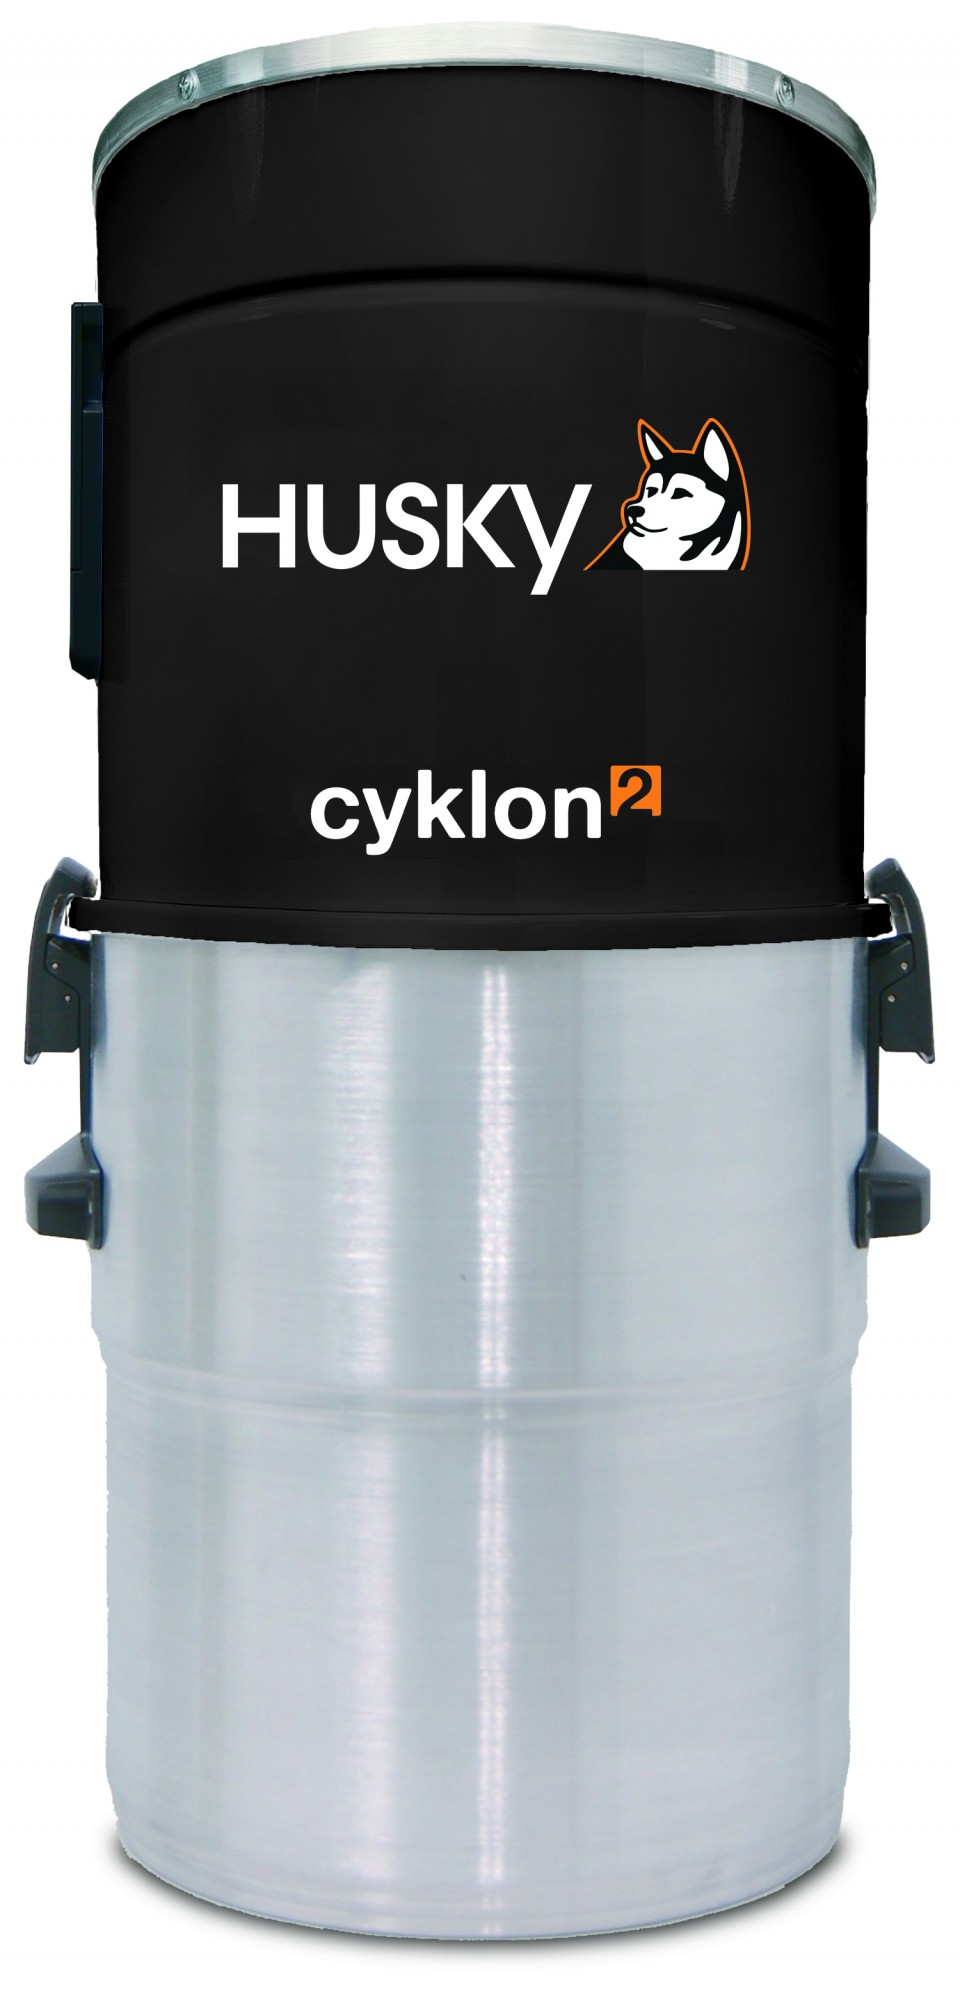 cyklon 2 centrale d aspiration poussi re hybride aspiration centralis e husky france. Black Bedroom Furniture Sets. Home Design Ideas